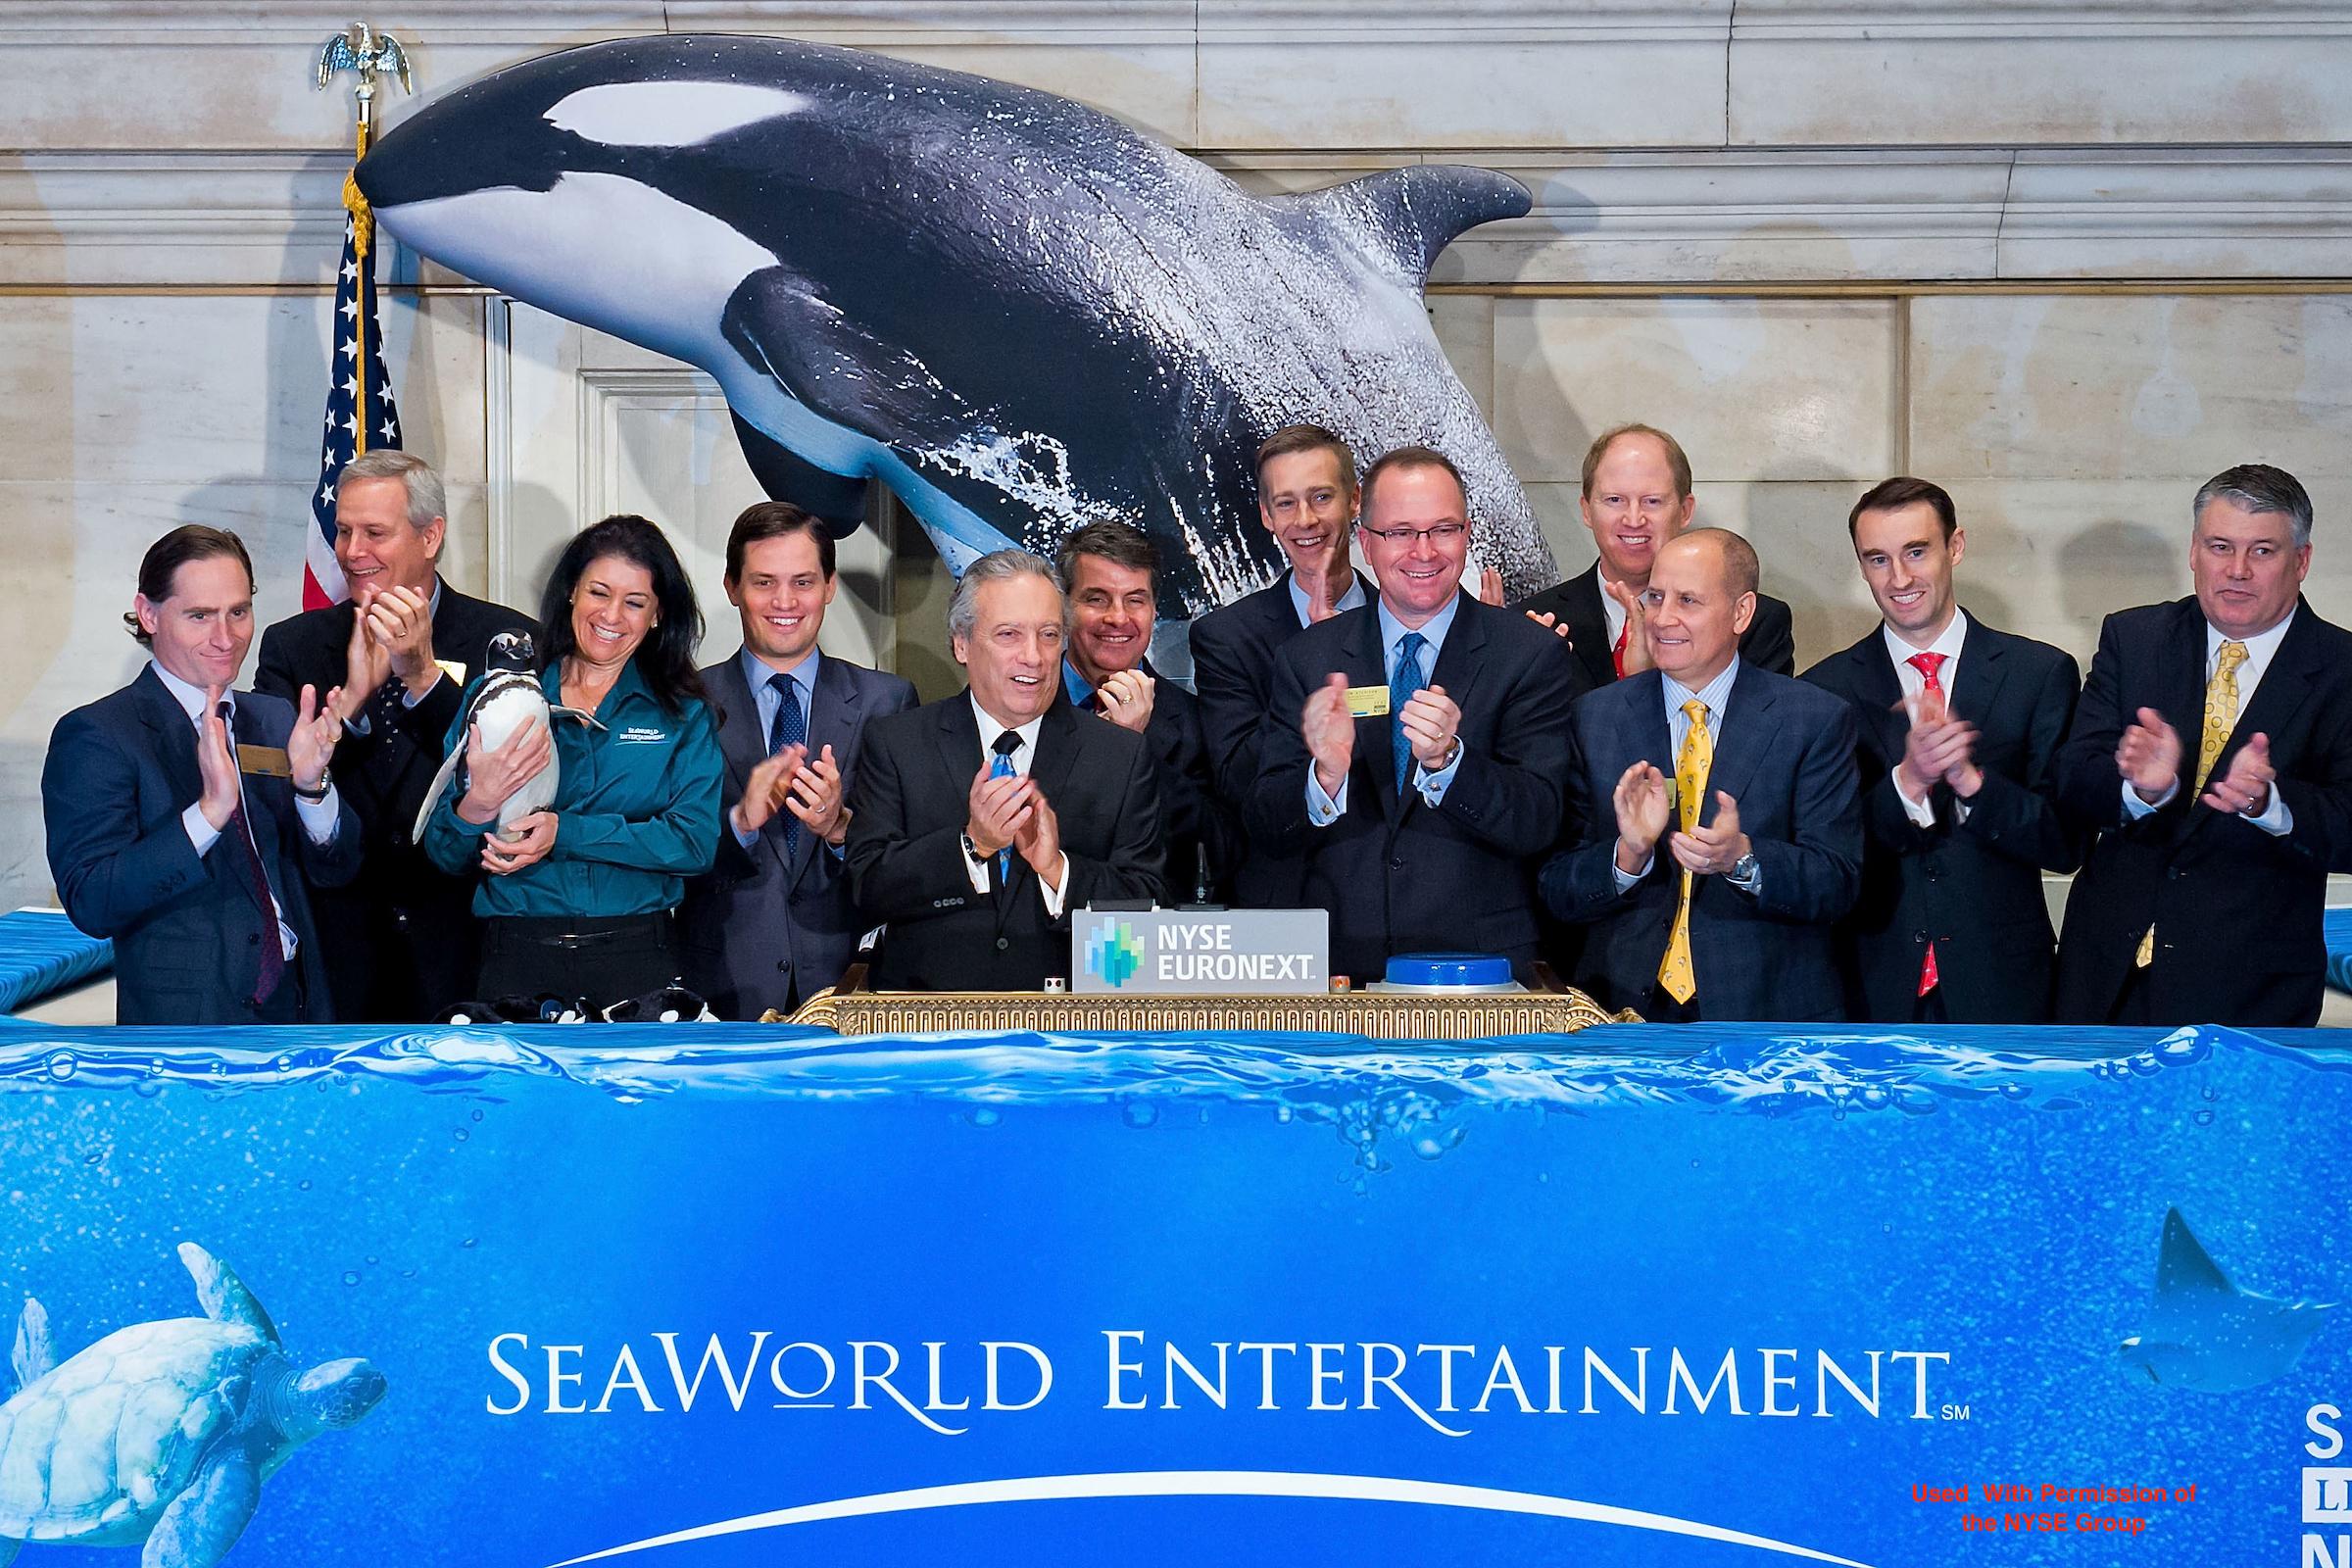 Seaworld Entertainment 4-19-13.jpg